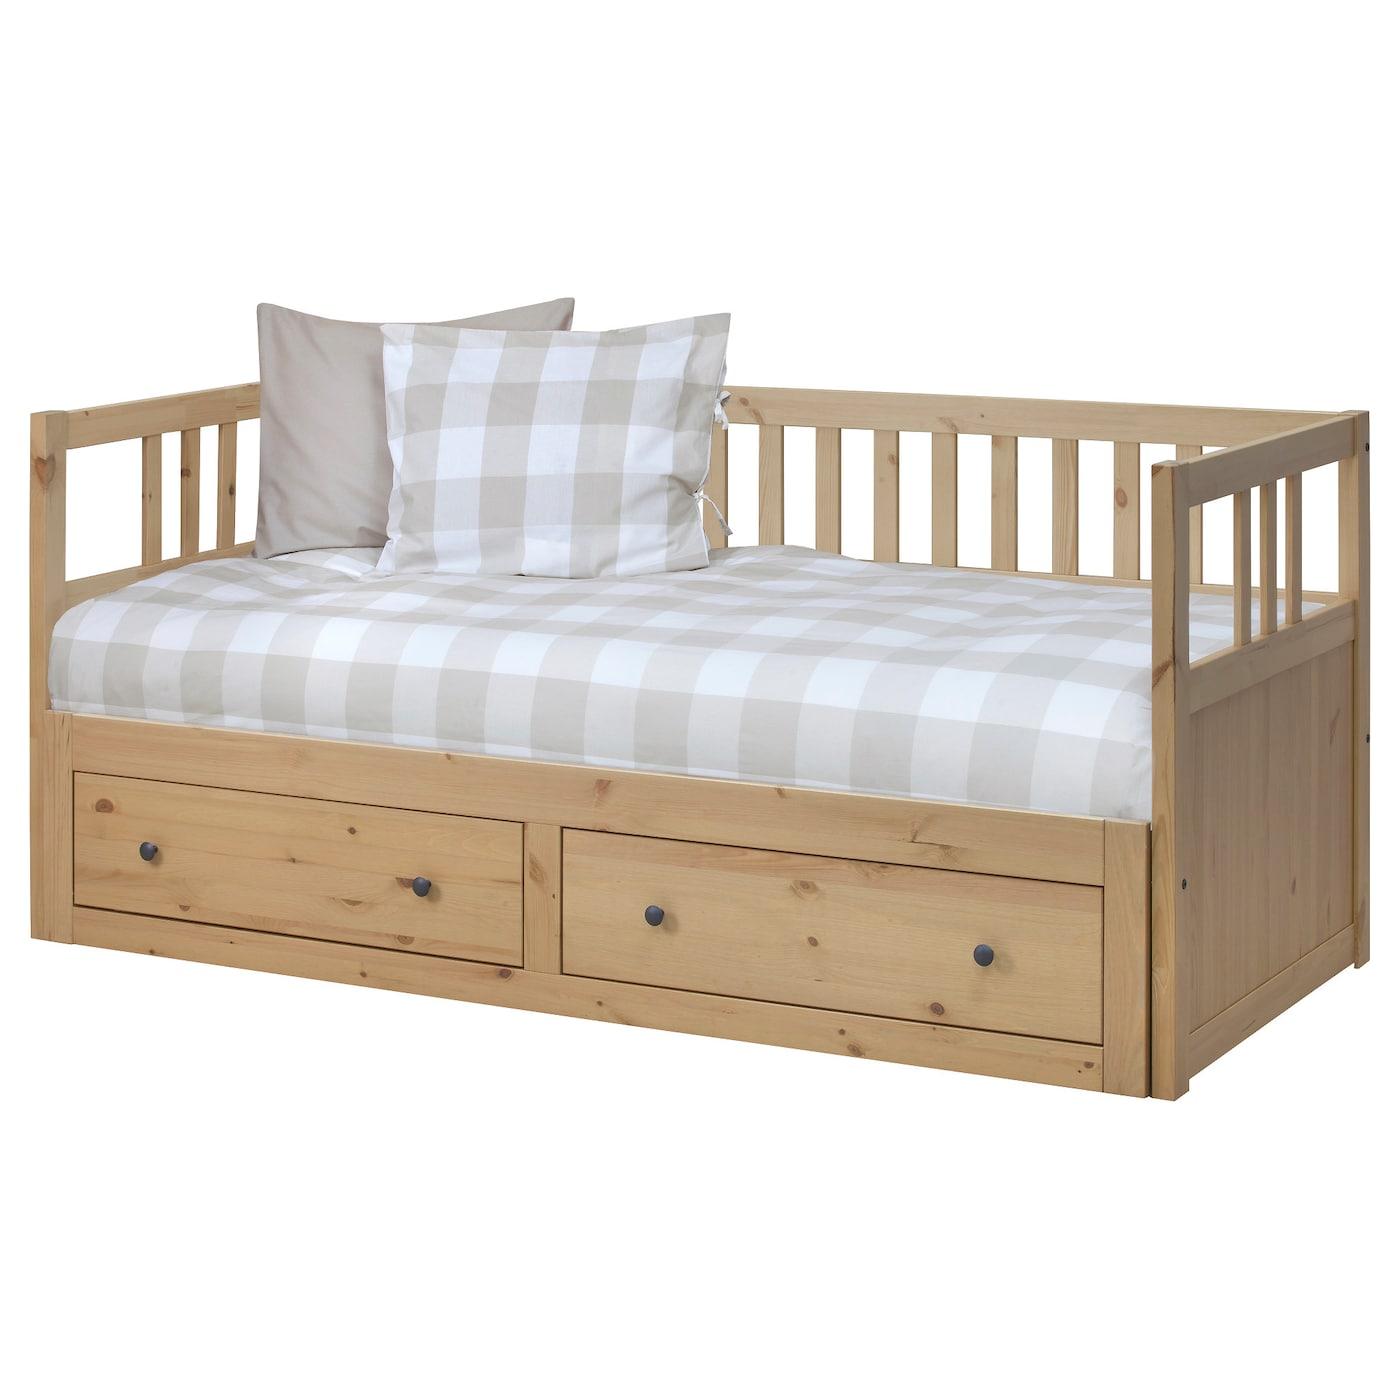 HEMNES Day-bed w 2 drawers/2 mattresses, light brown/Malfors medium firm, 80x200 cm